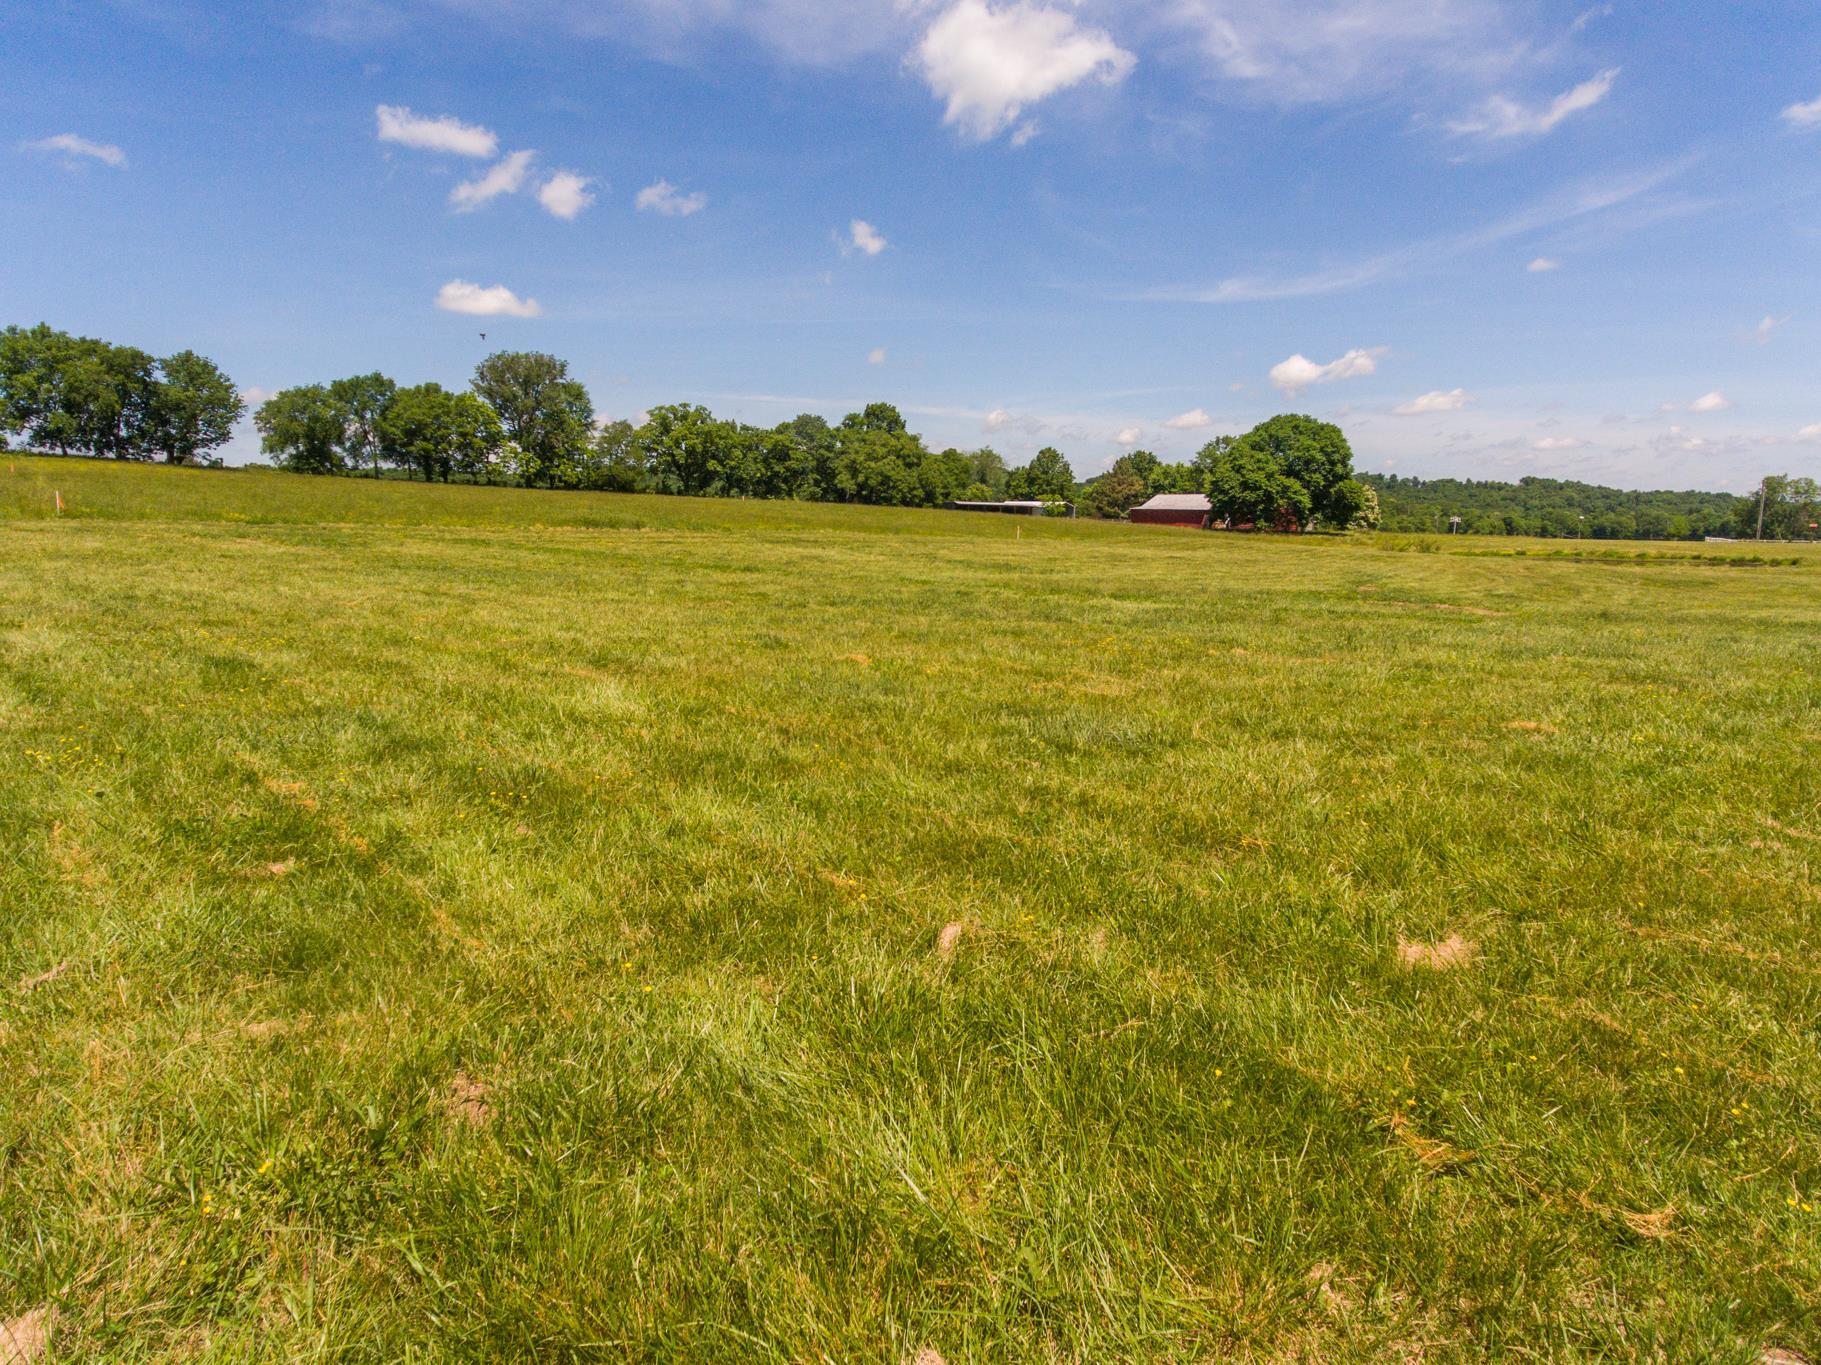 1410 Grant rd, Watertown, TN 37184 - Watertown, TN real estate listing